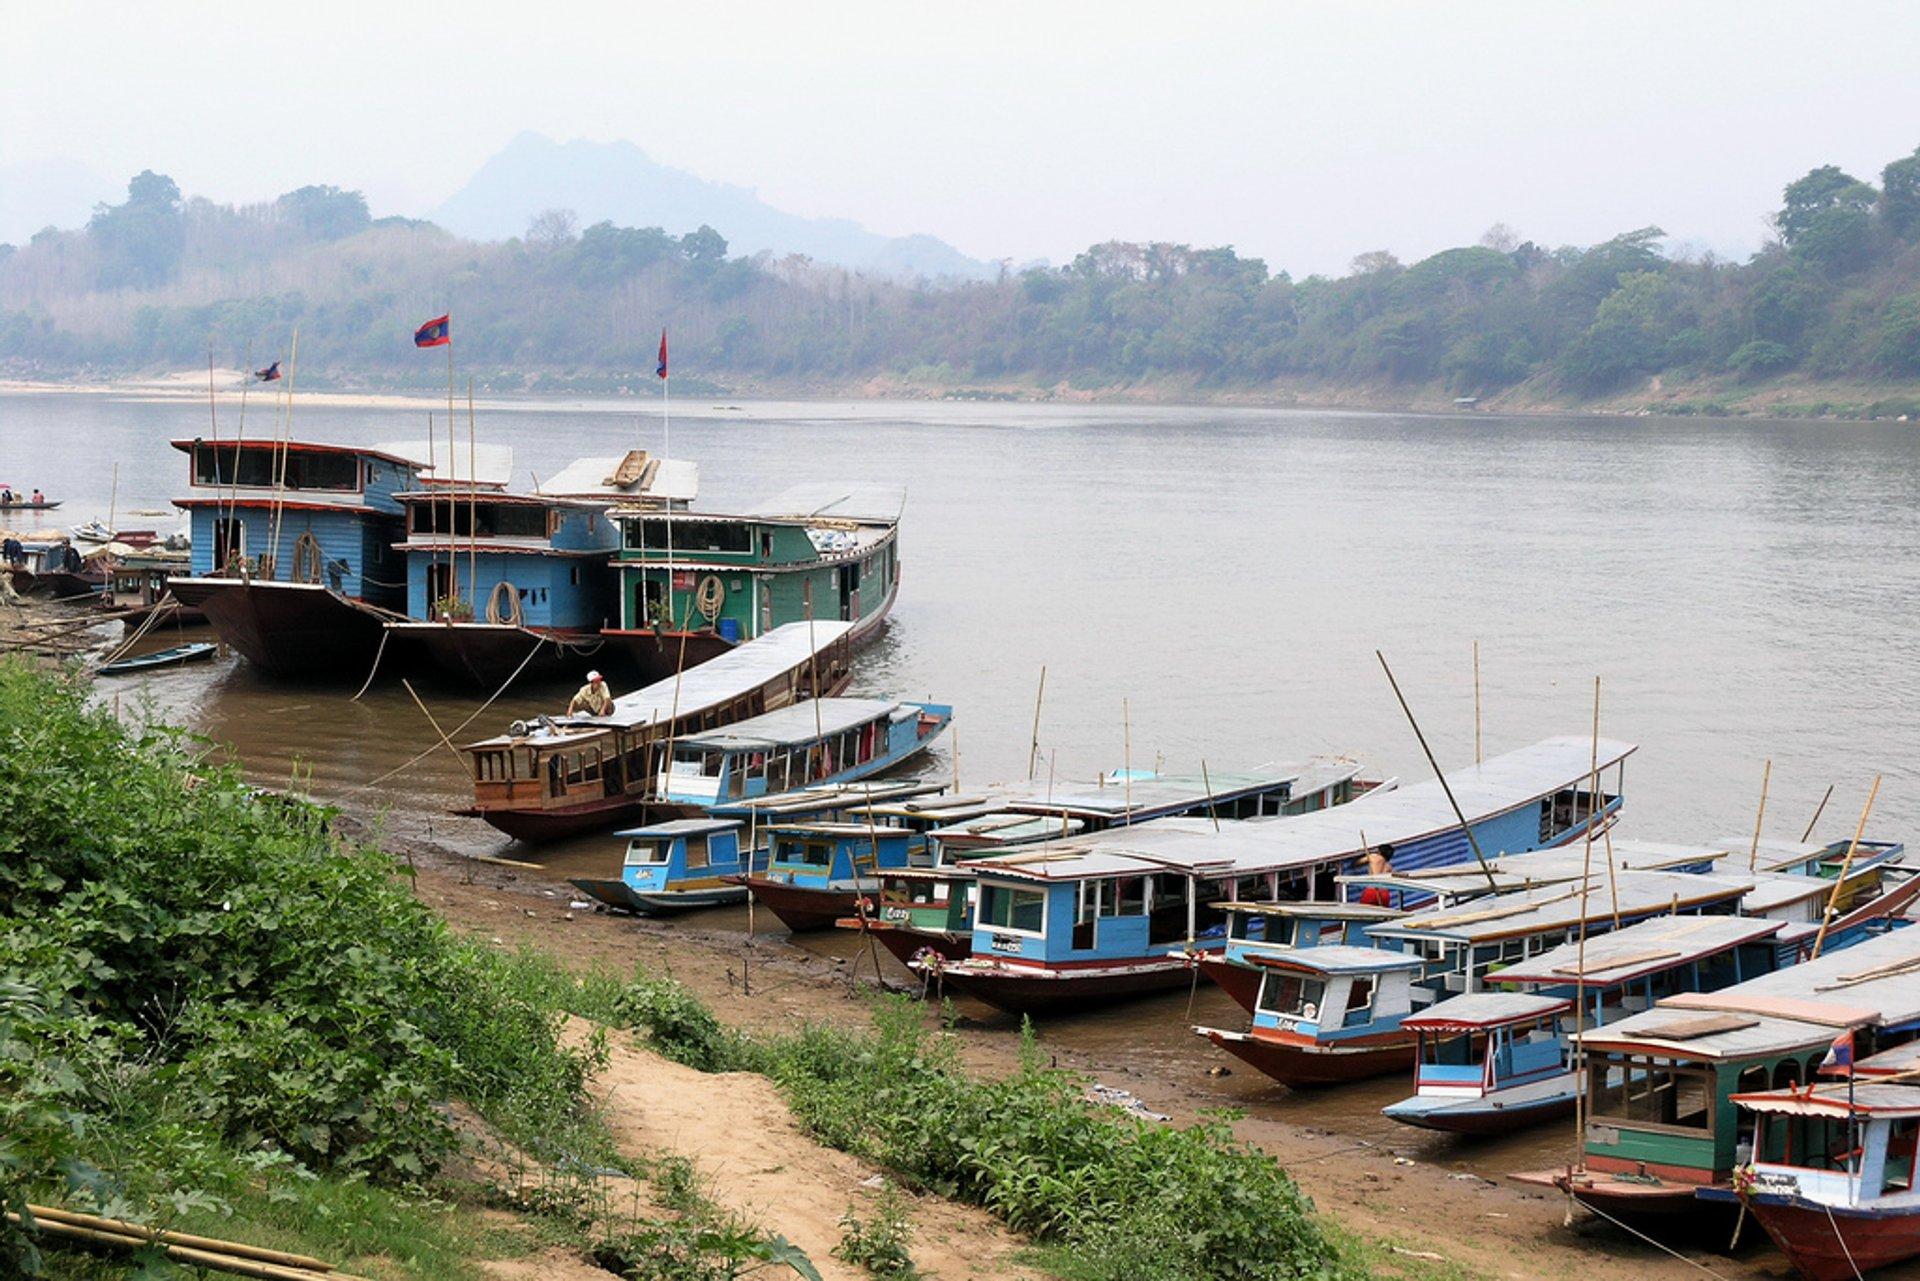 Slow Boat on the Mekong River in Laos - Best Season 2020